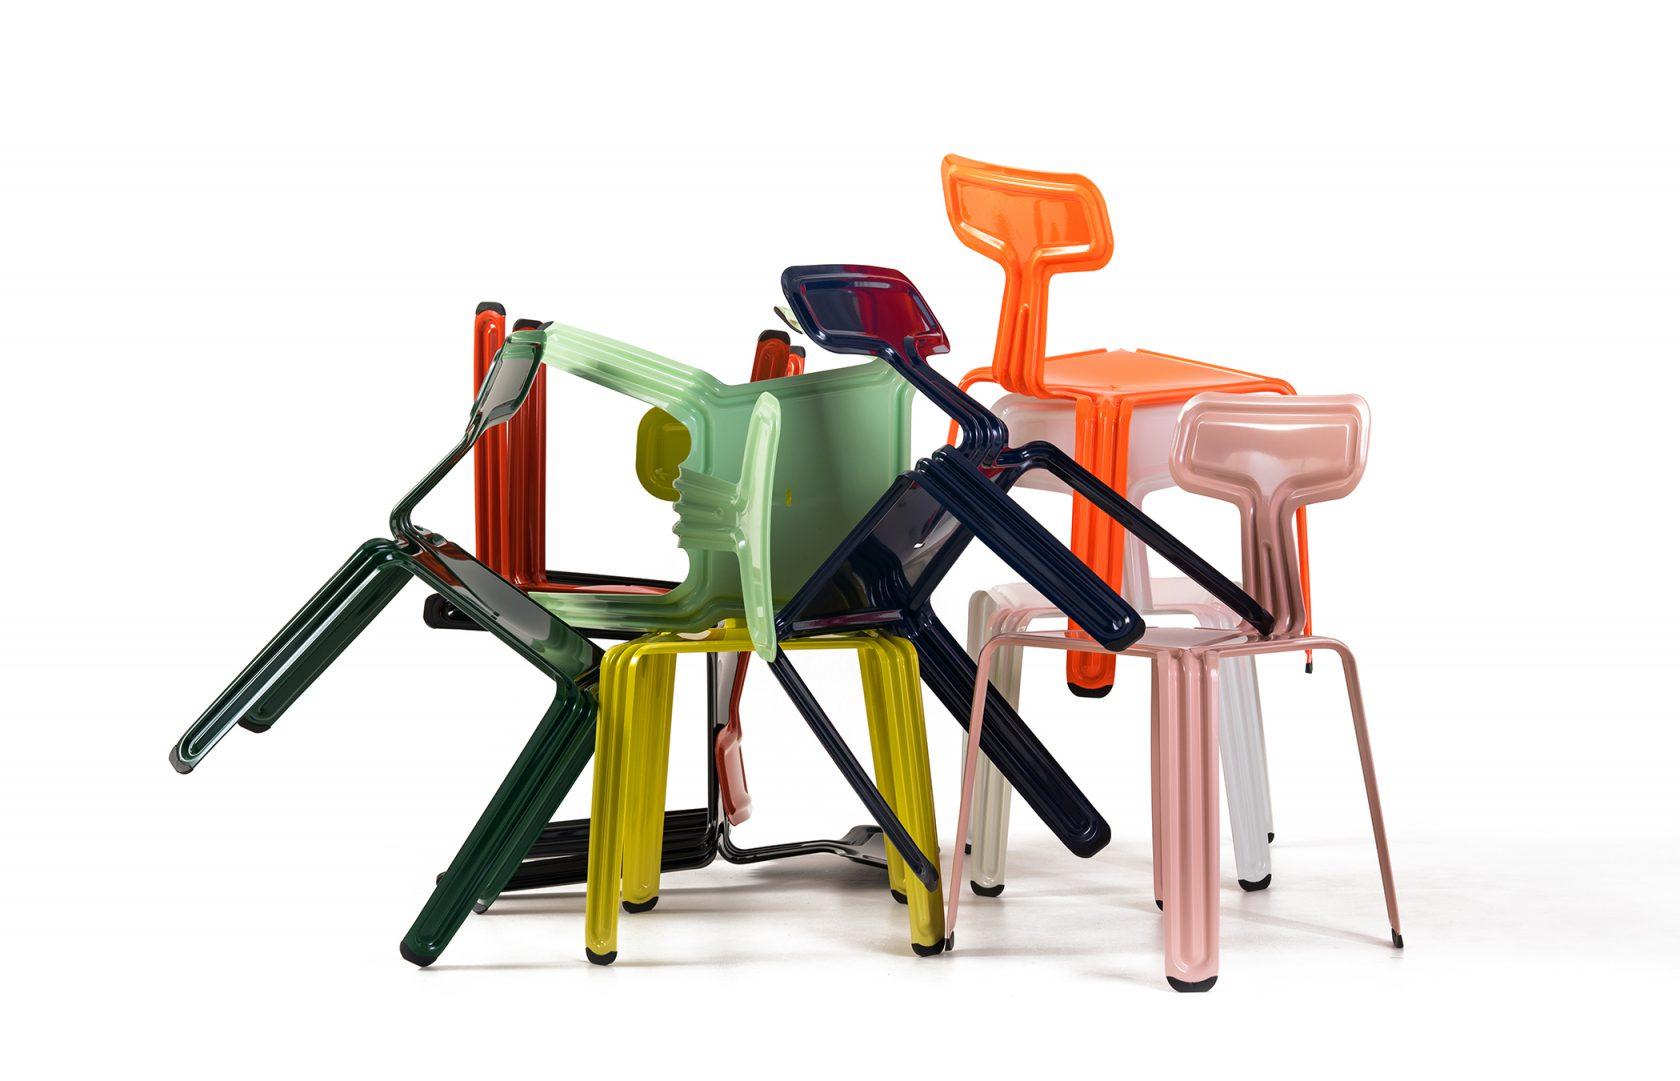 Pressed Chair Alle Farben Rgb (∏nils Holger Moormann Gmbh)